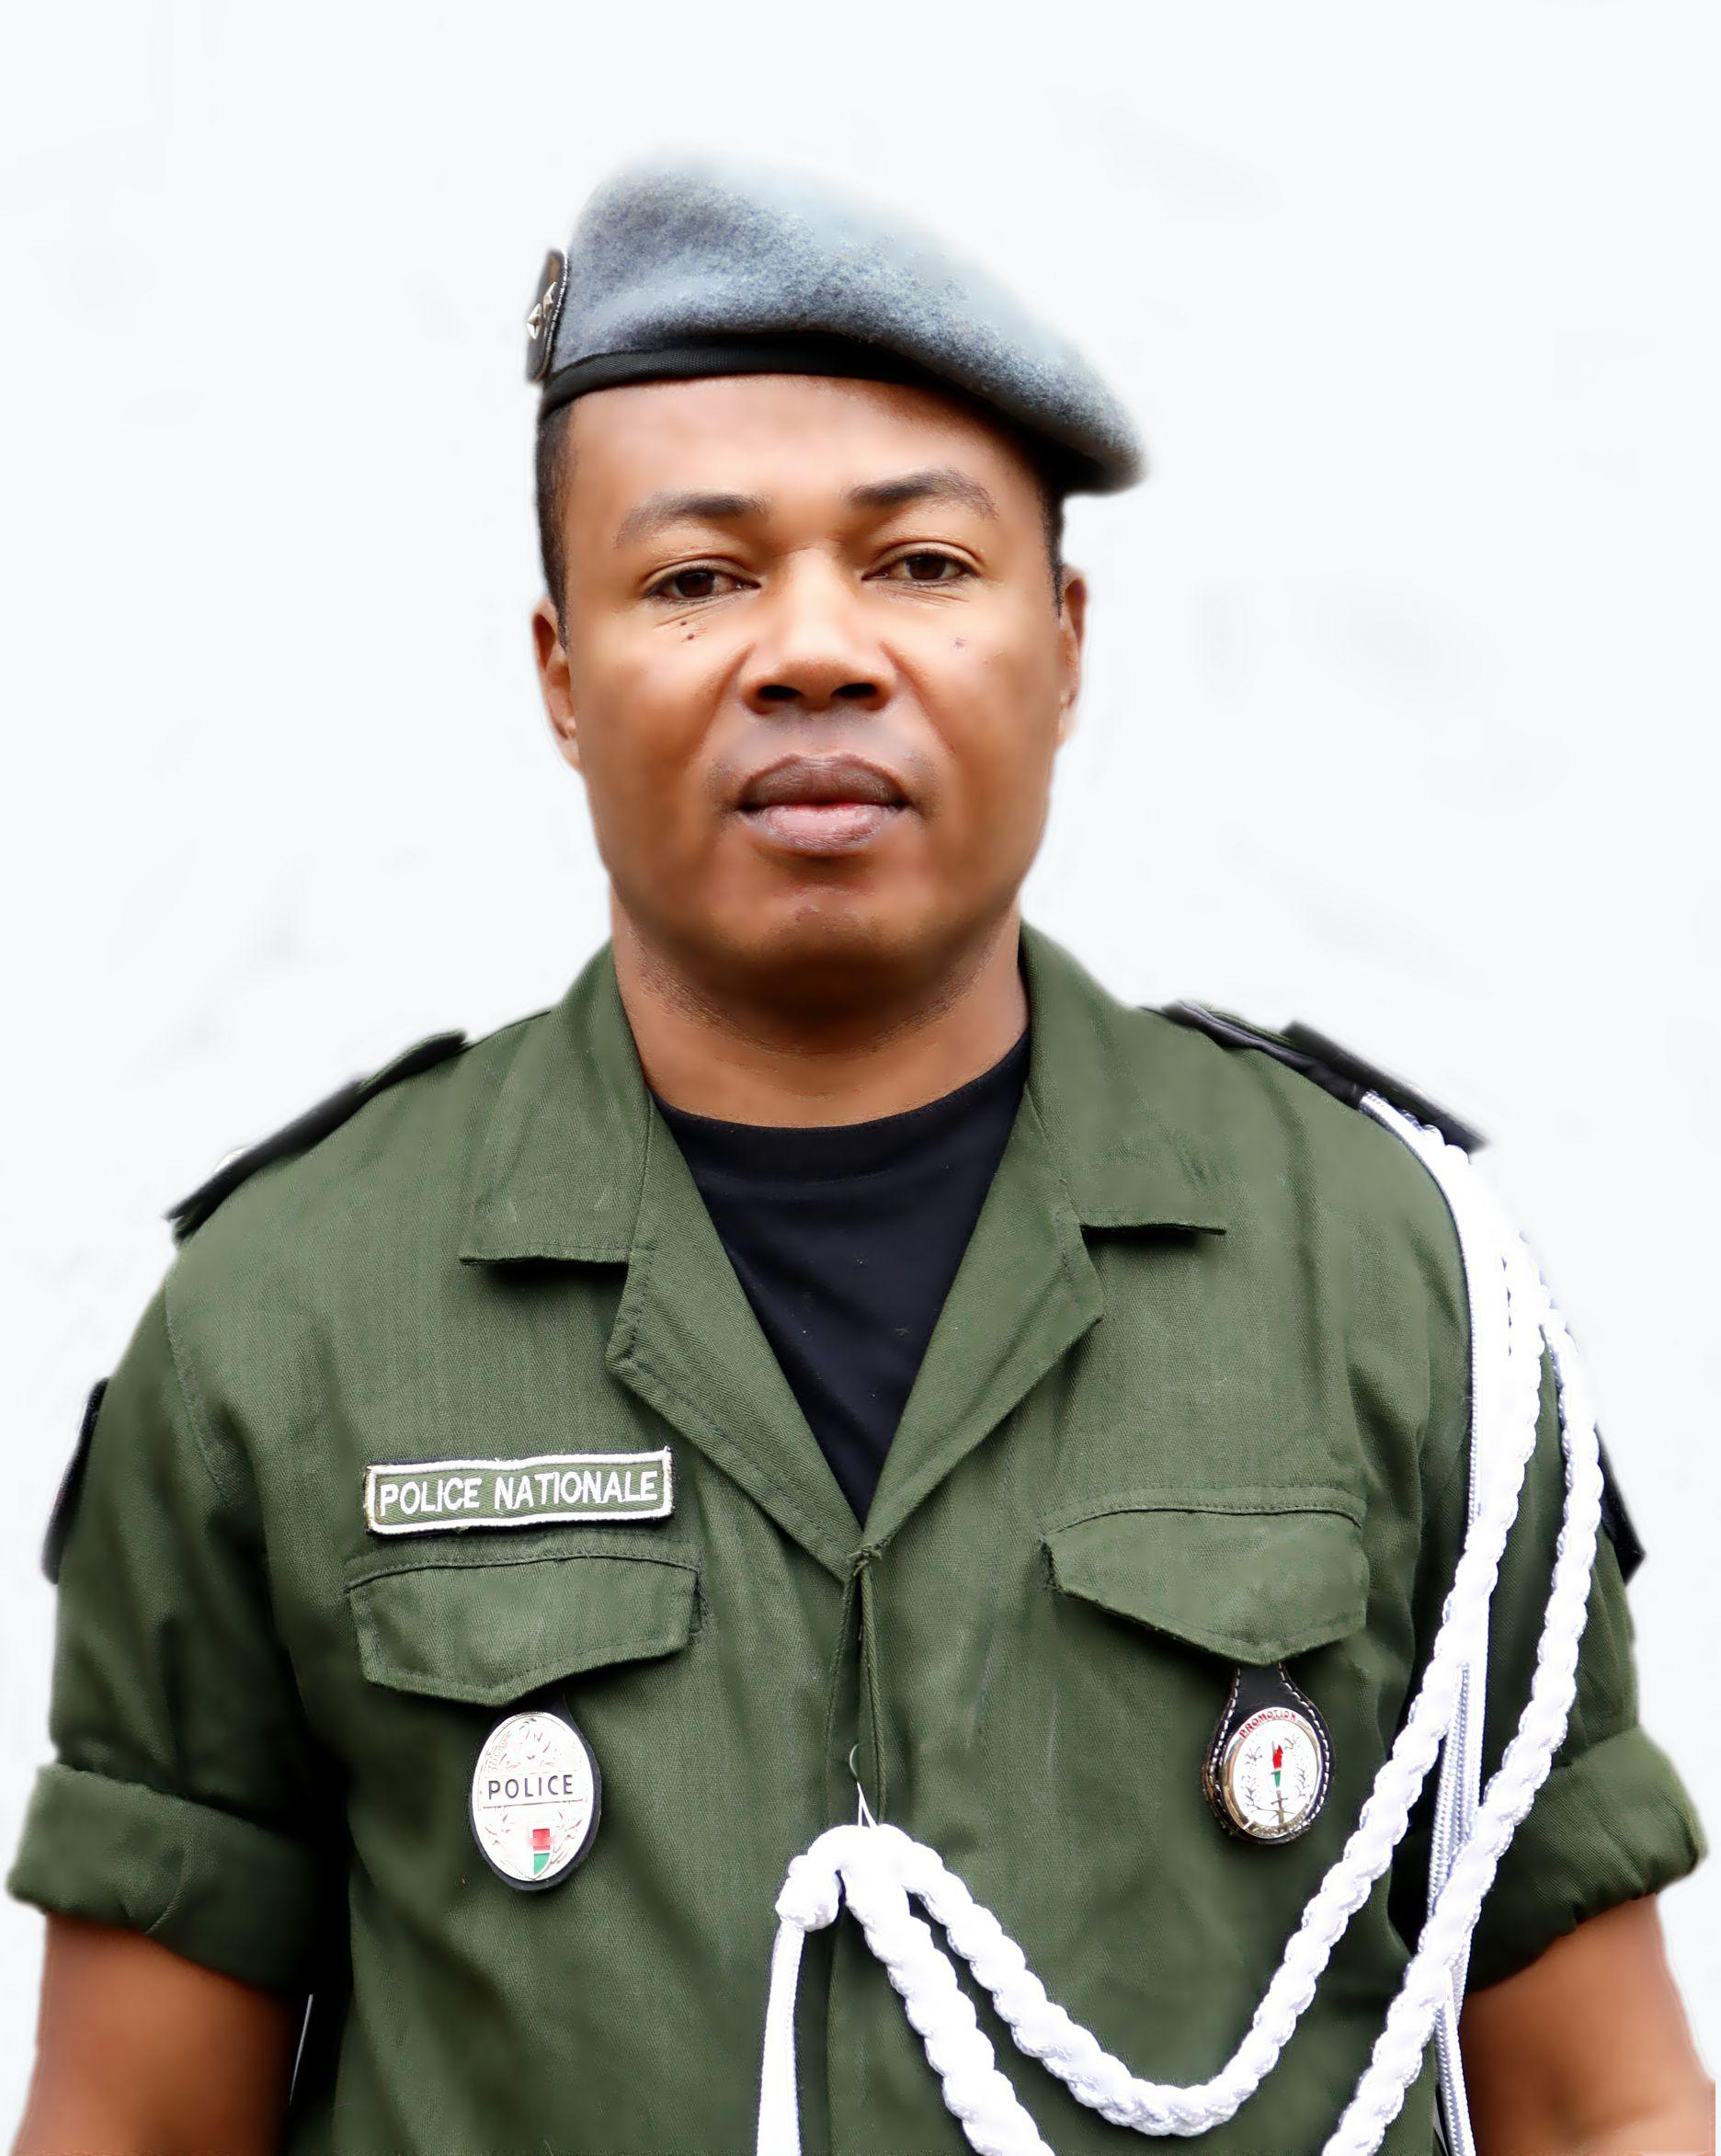 Commissaire Divisionnaire de Police, ANDRIAMANANTSOA Zakatiana Pierre Donatien,